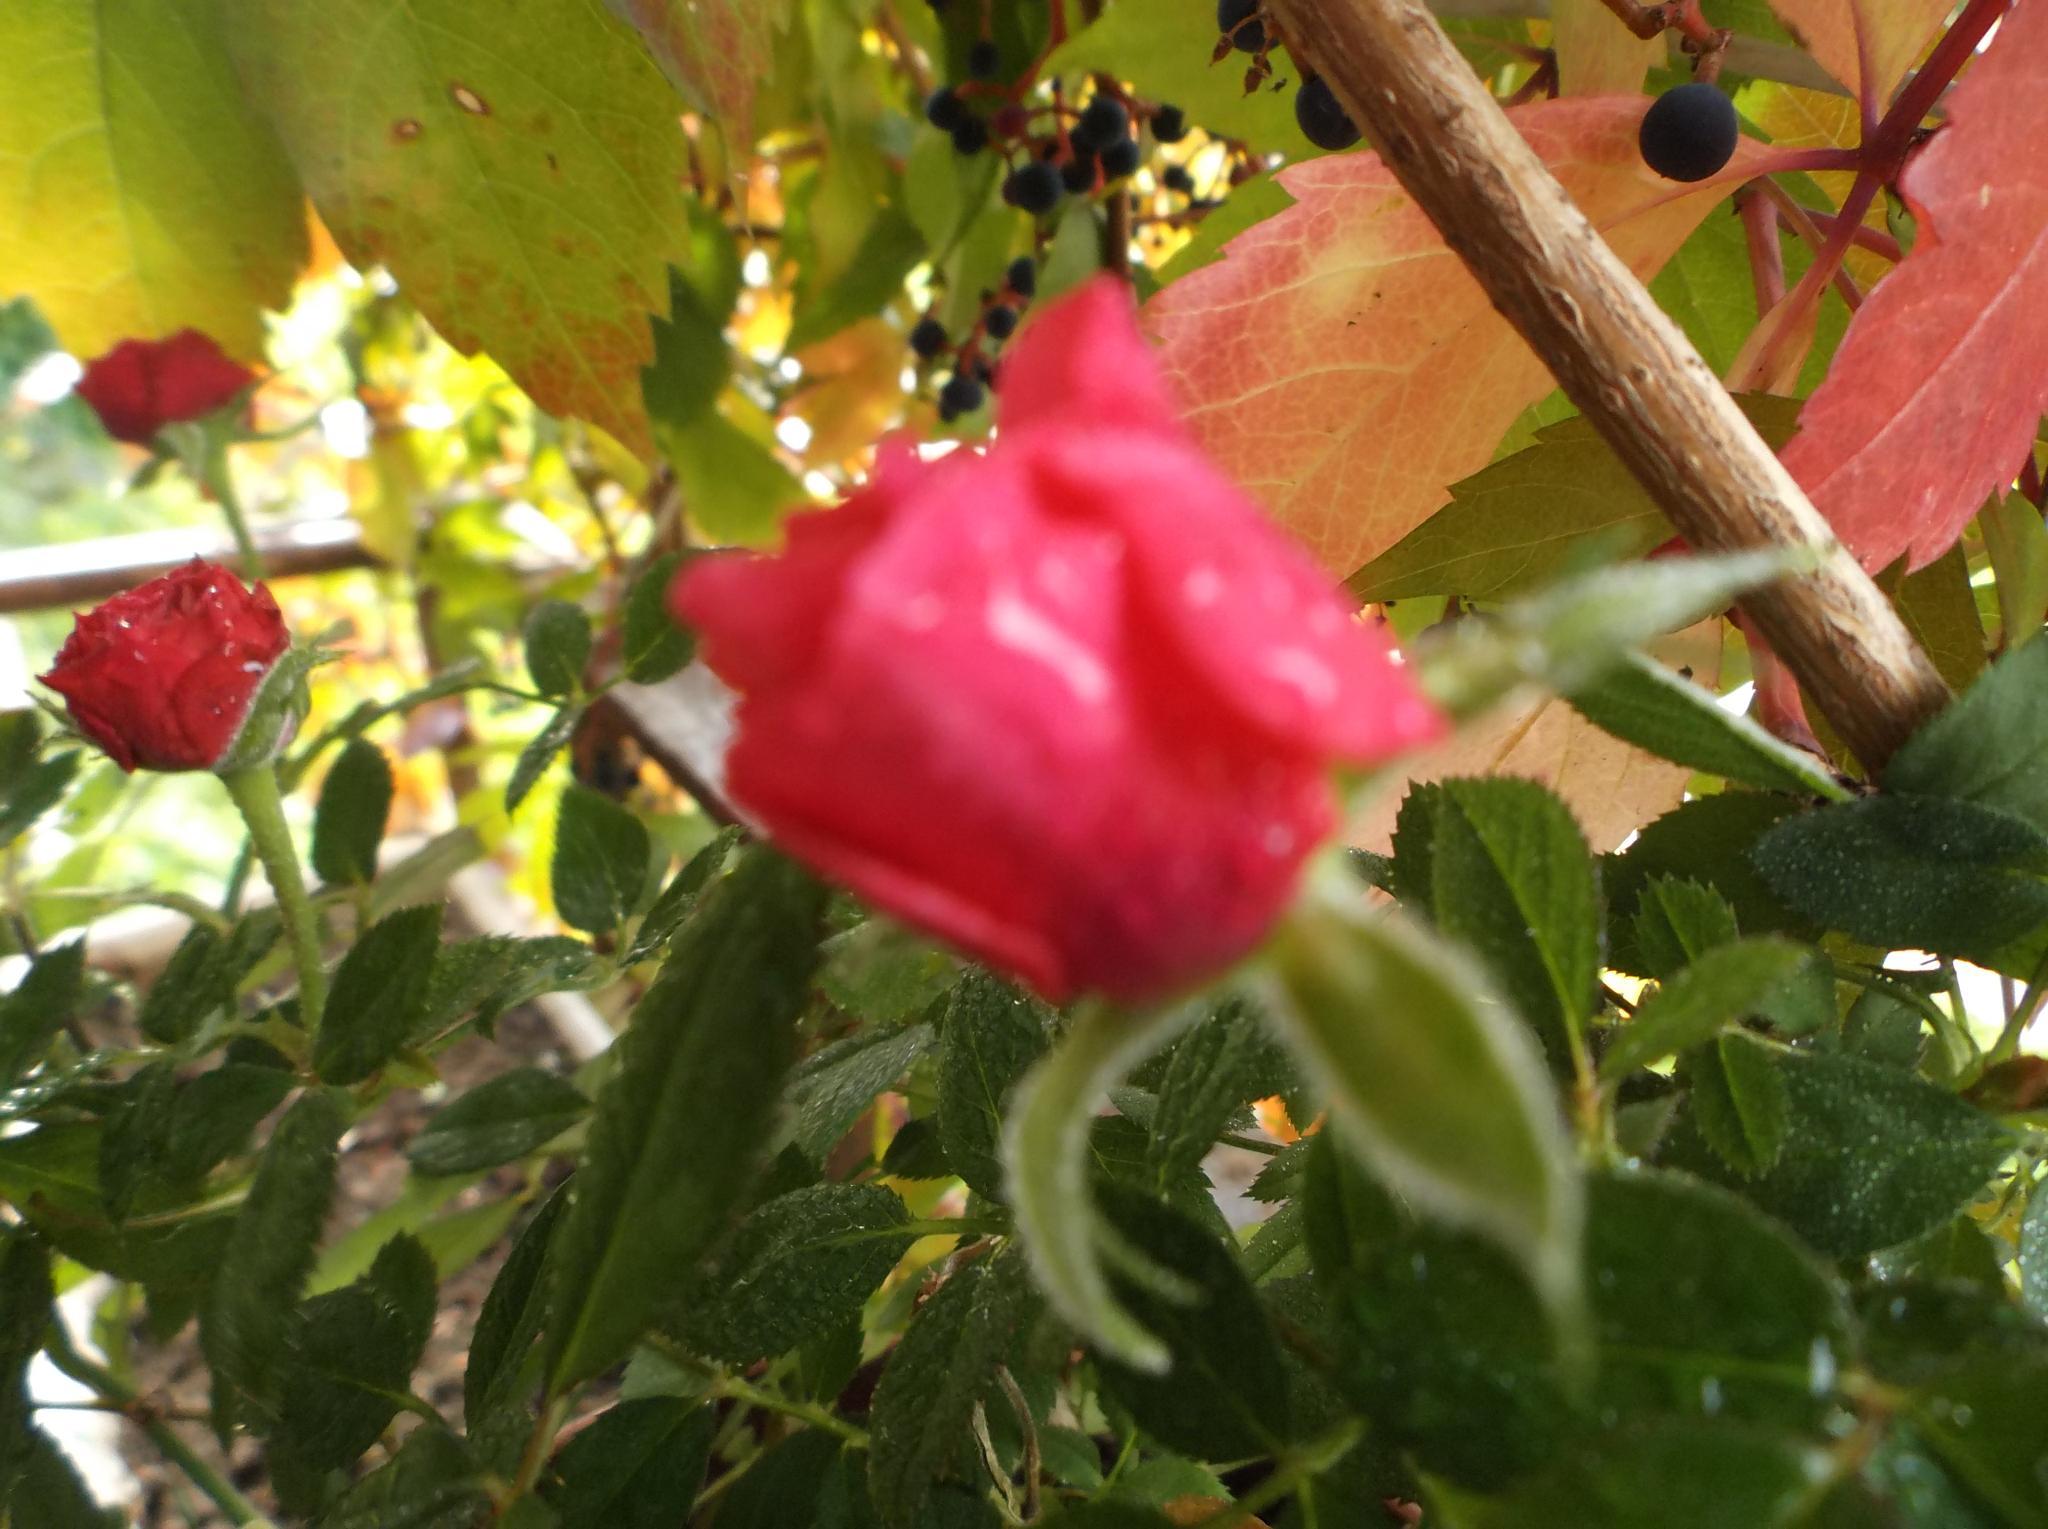 Roses in the rain. by Zita Užkuraitienė